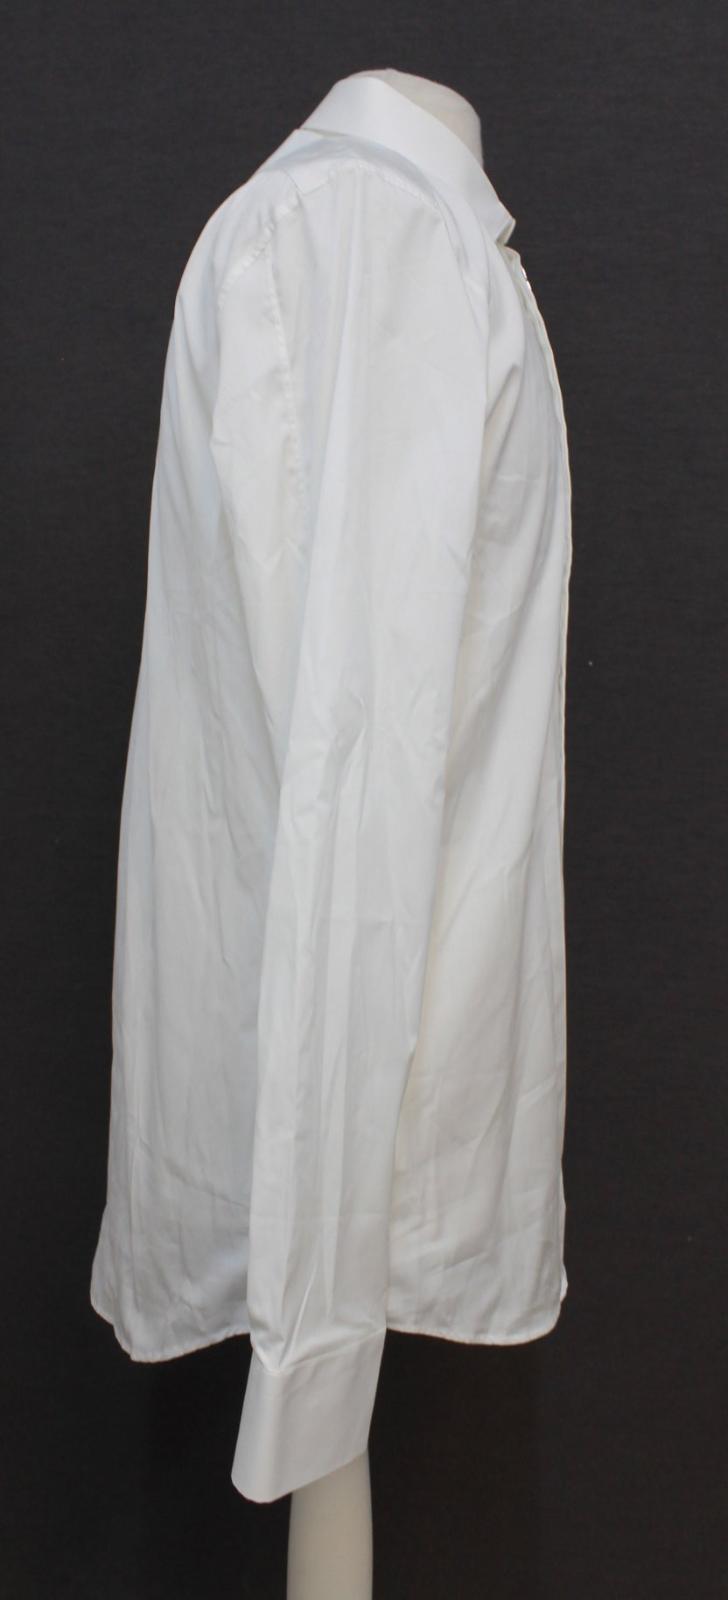 Neil-Barrett-para-hombre-calce-cenido-de-algodon-blanco-frontal-con-cremallera-con-cuello-camisa miniatura 4